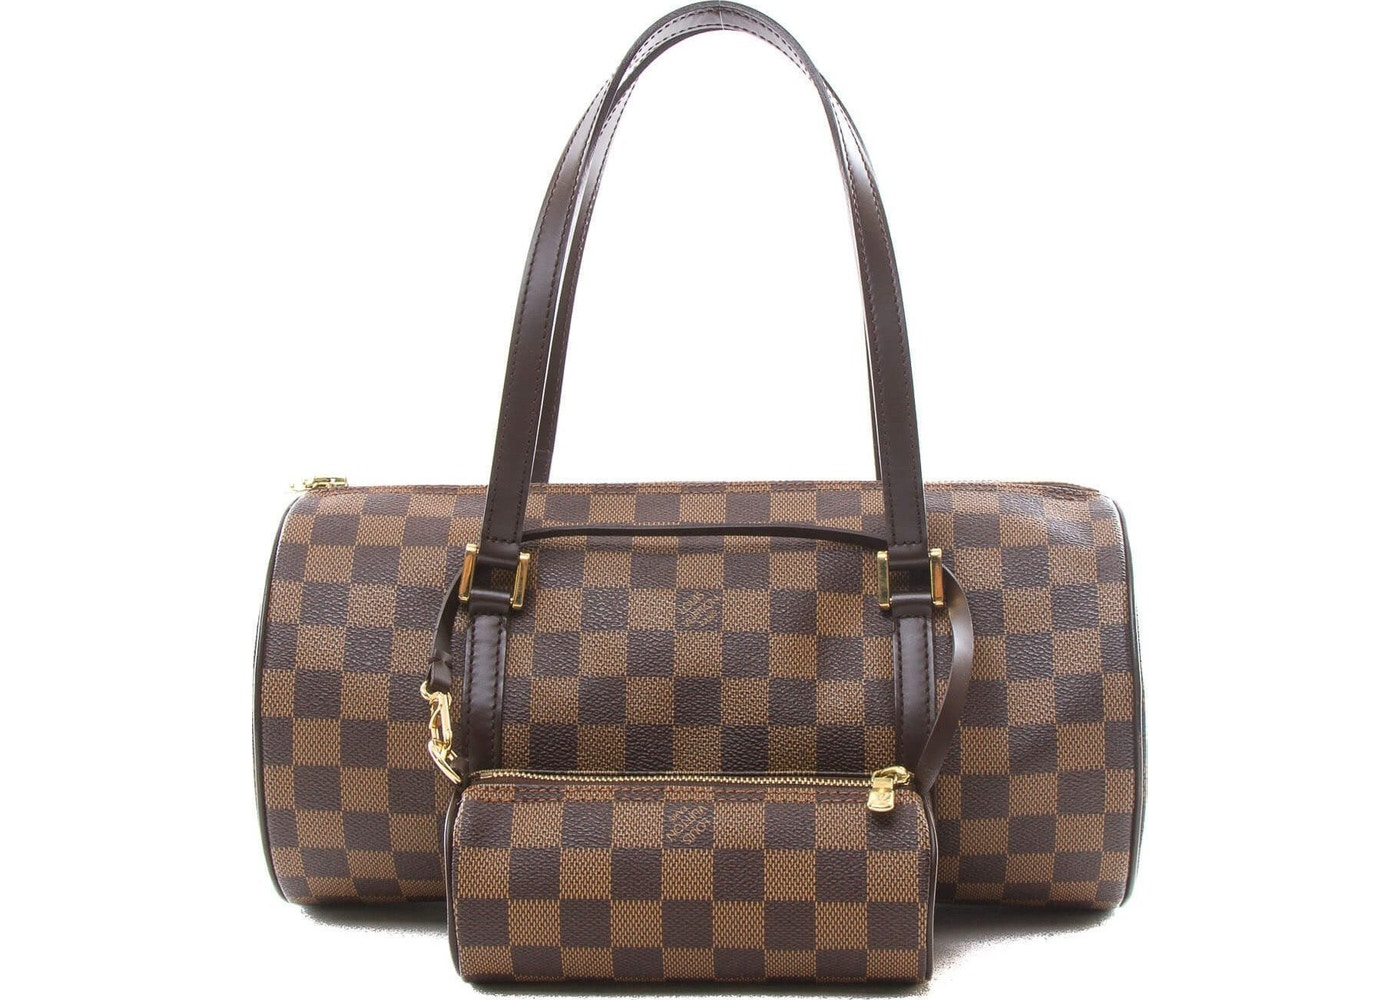 Louis Vuitton Papillon Damier Ebene 30 Brown. Damier Ebene 30 Brown cb623fed926b